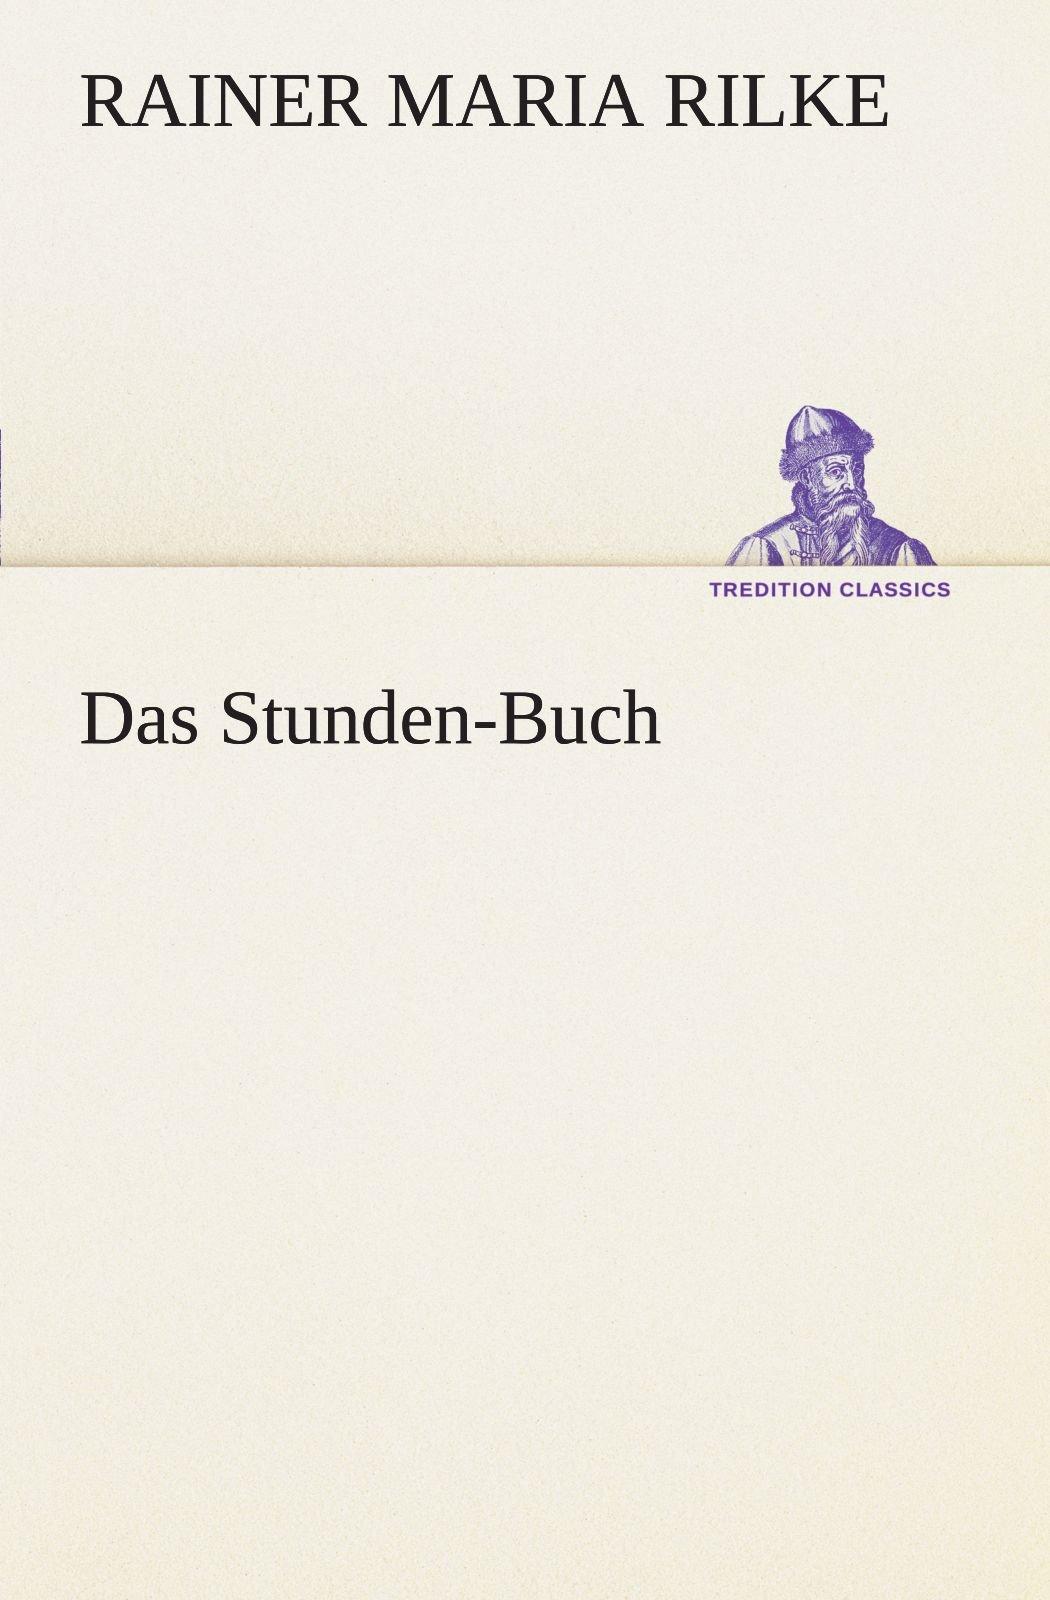 Das Stunden-Buch (TREDITION CLASSICS) (German Edition) PDF